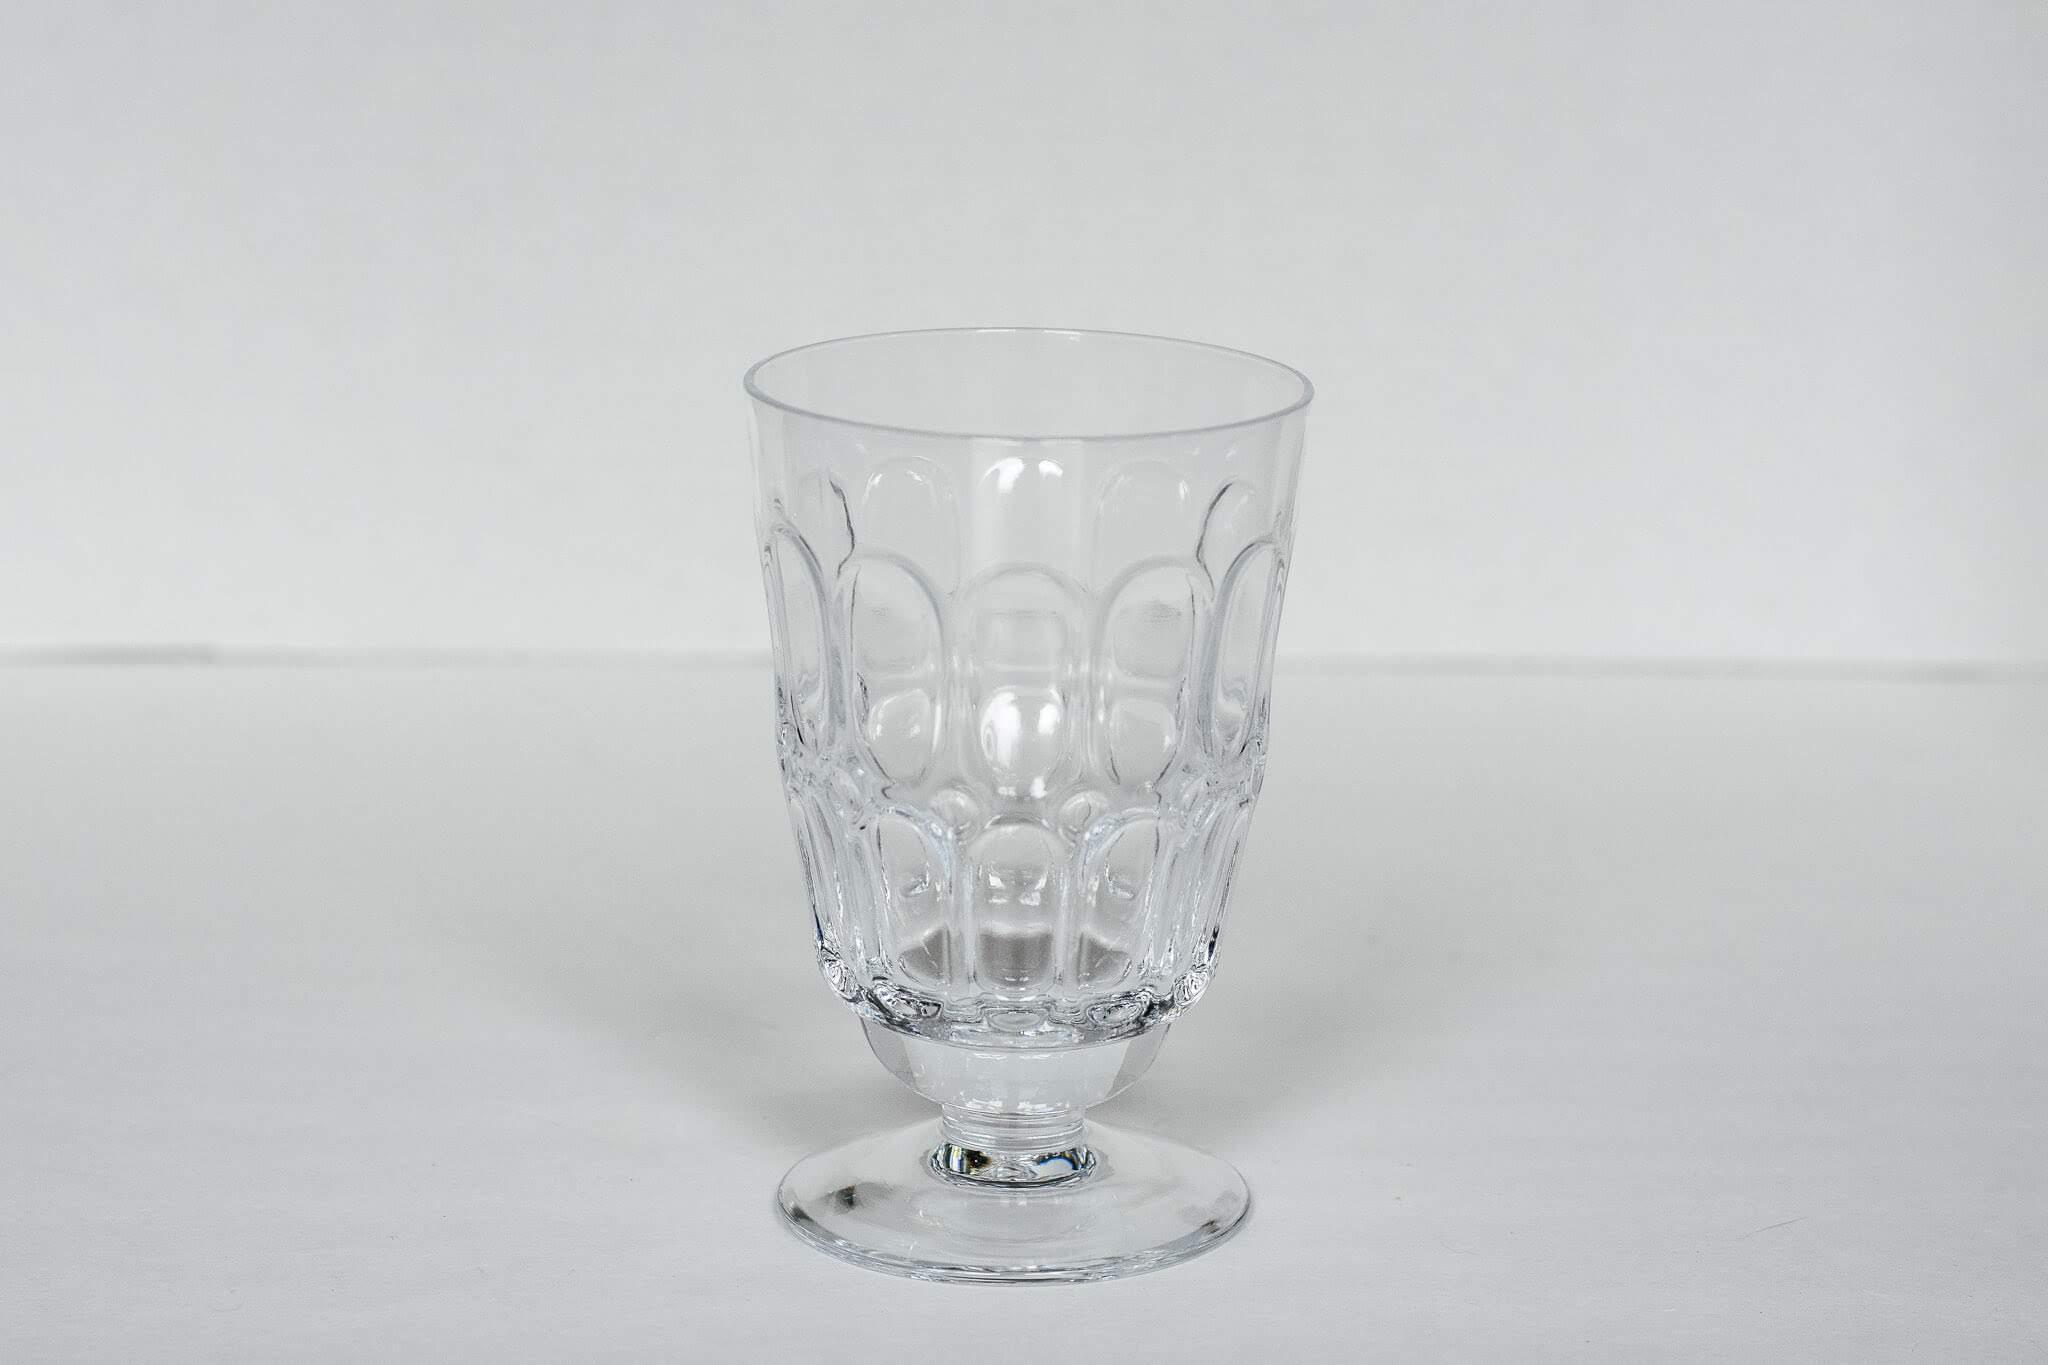 Glassware-37.jpg